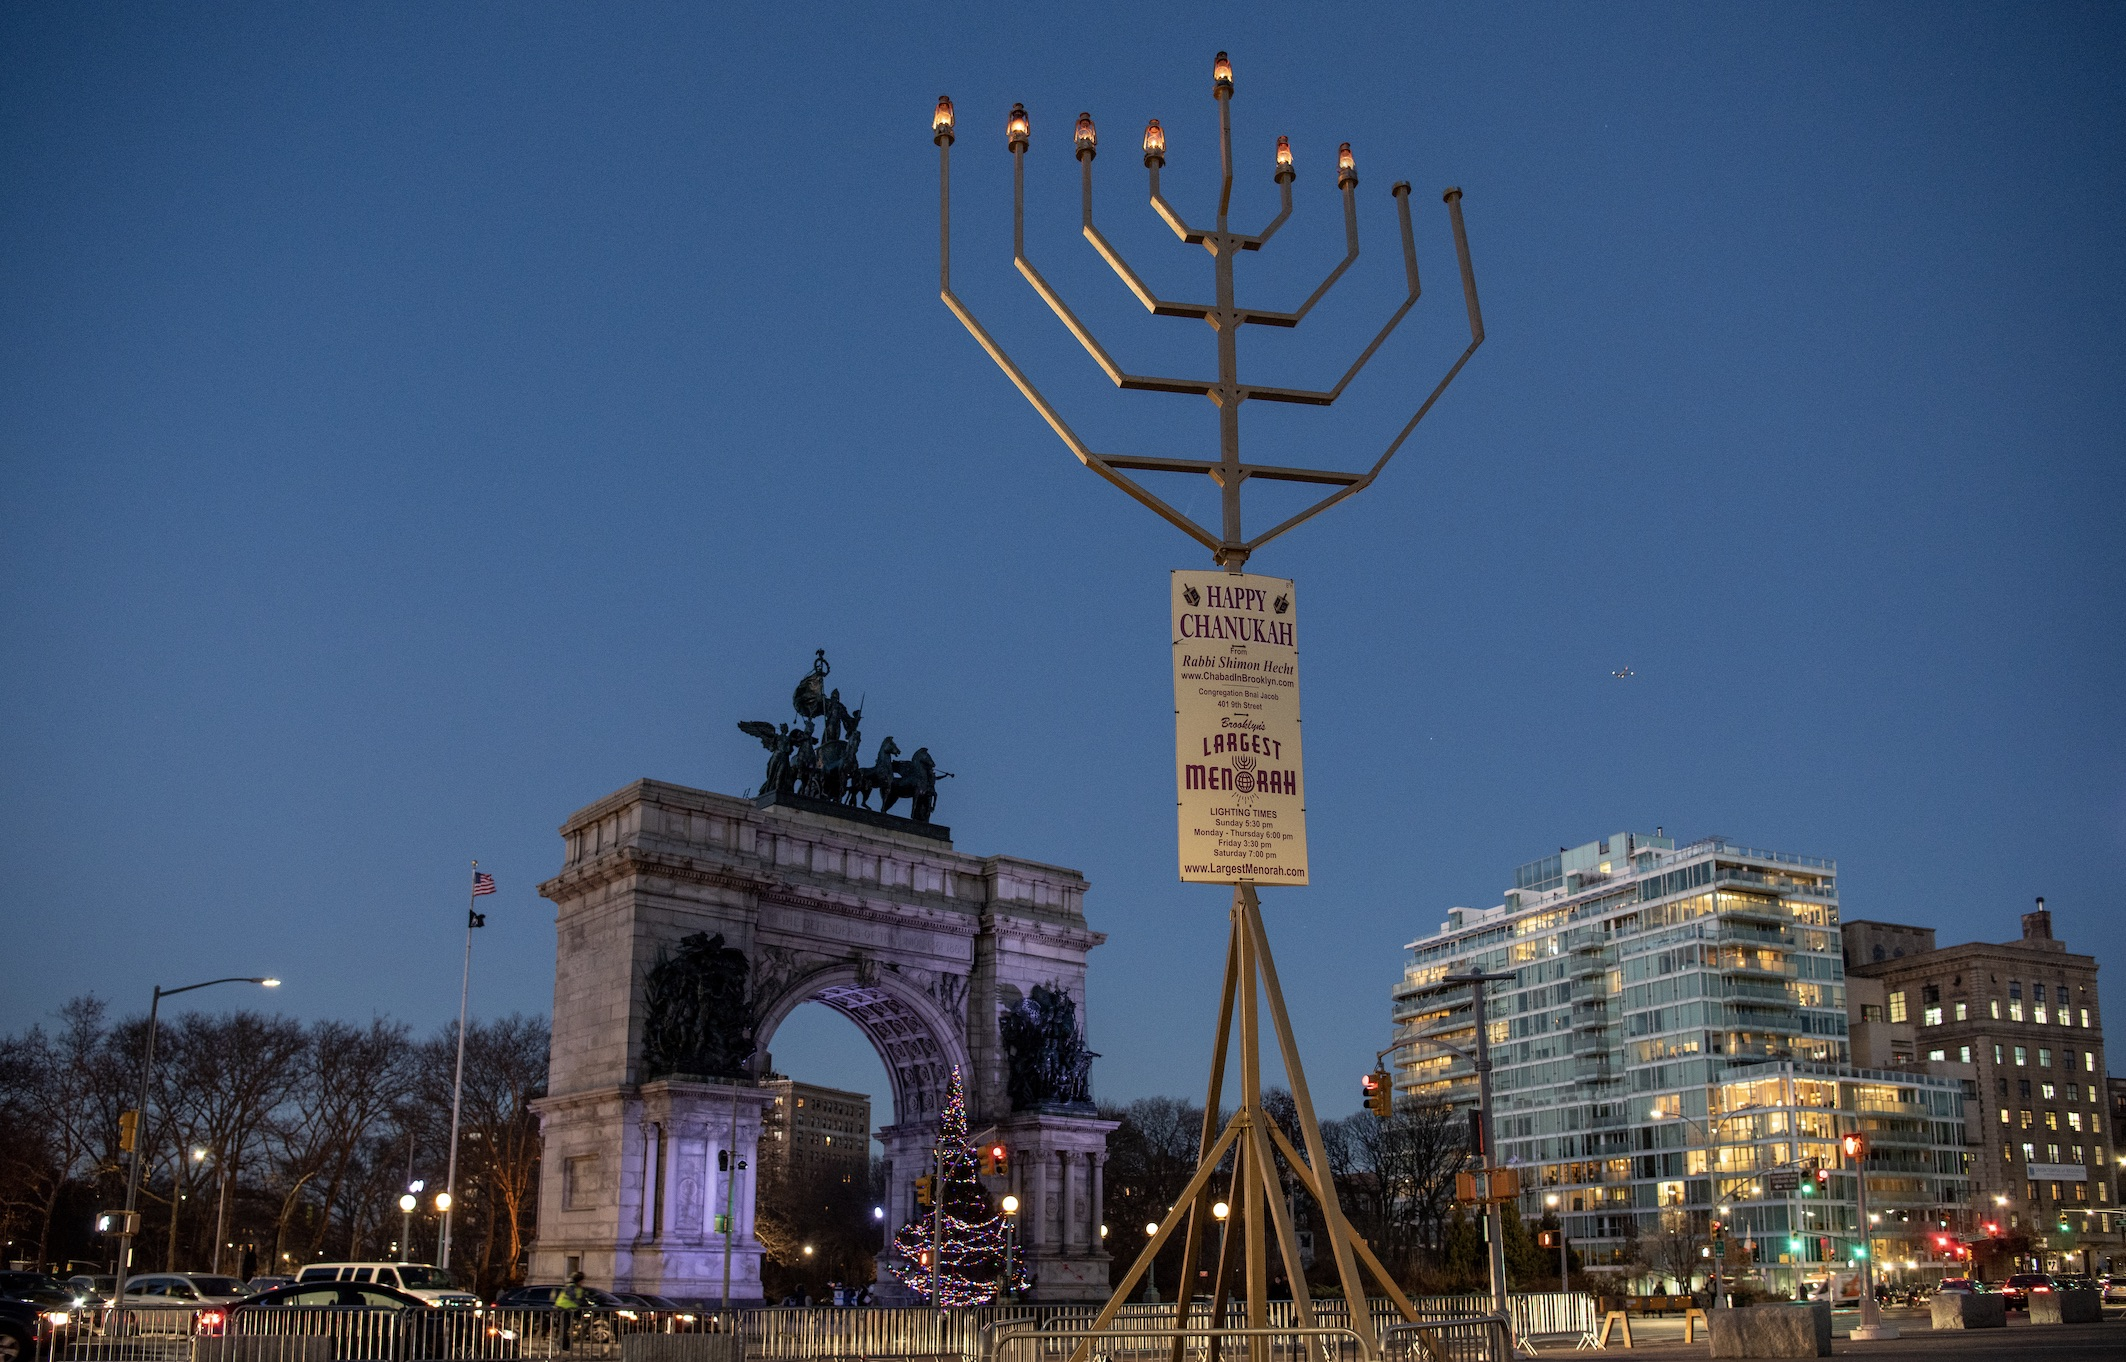 2. Lighting of the Largest Menorah in Brooklyn and Lighting of the World's Largest Menorah: Manhattan